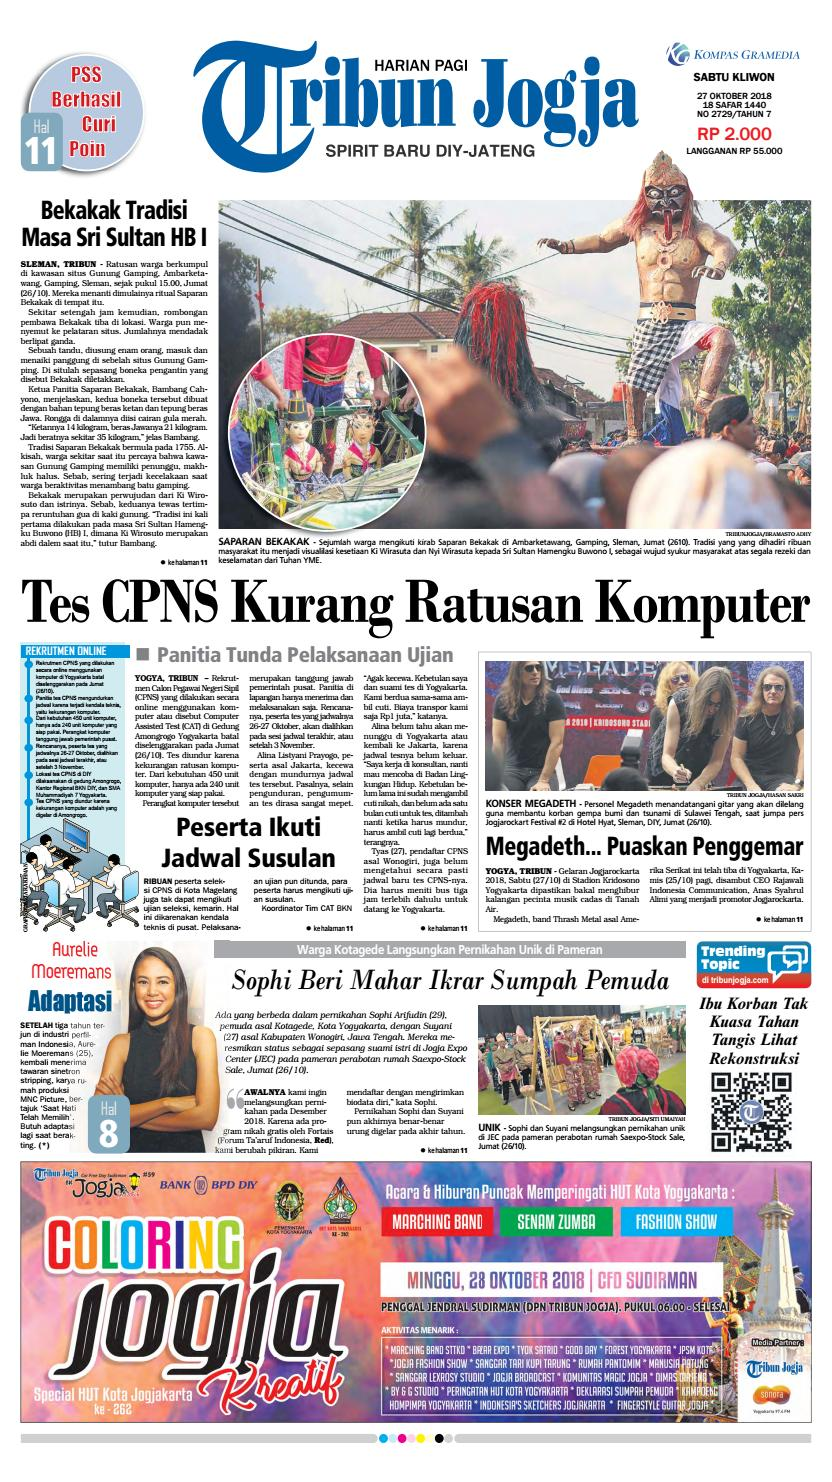 Tribun Jogja 27 10 2018 By Issuu Produk Ukm Bumn Batik Tulis Warna Alam Ra Ampamp